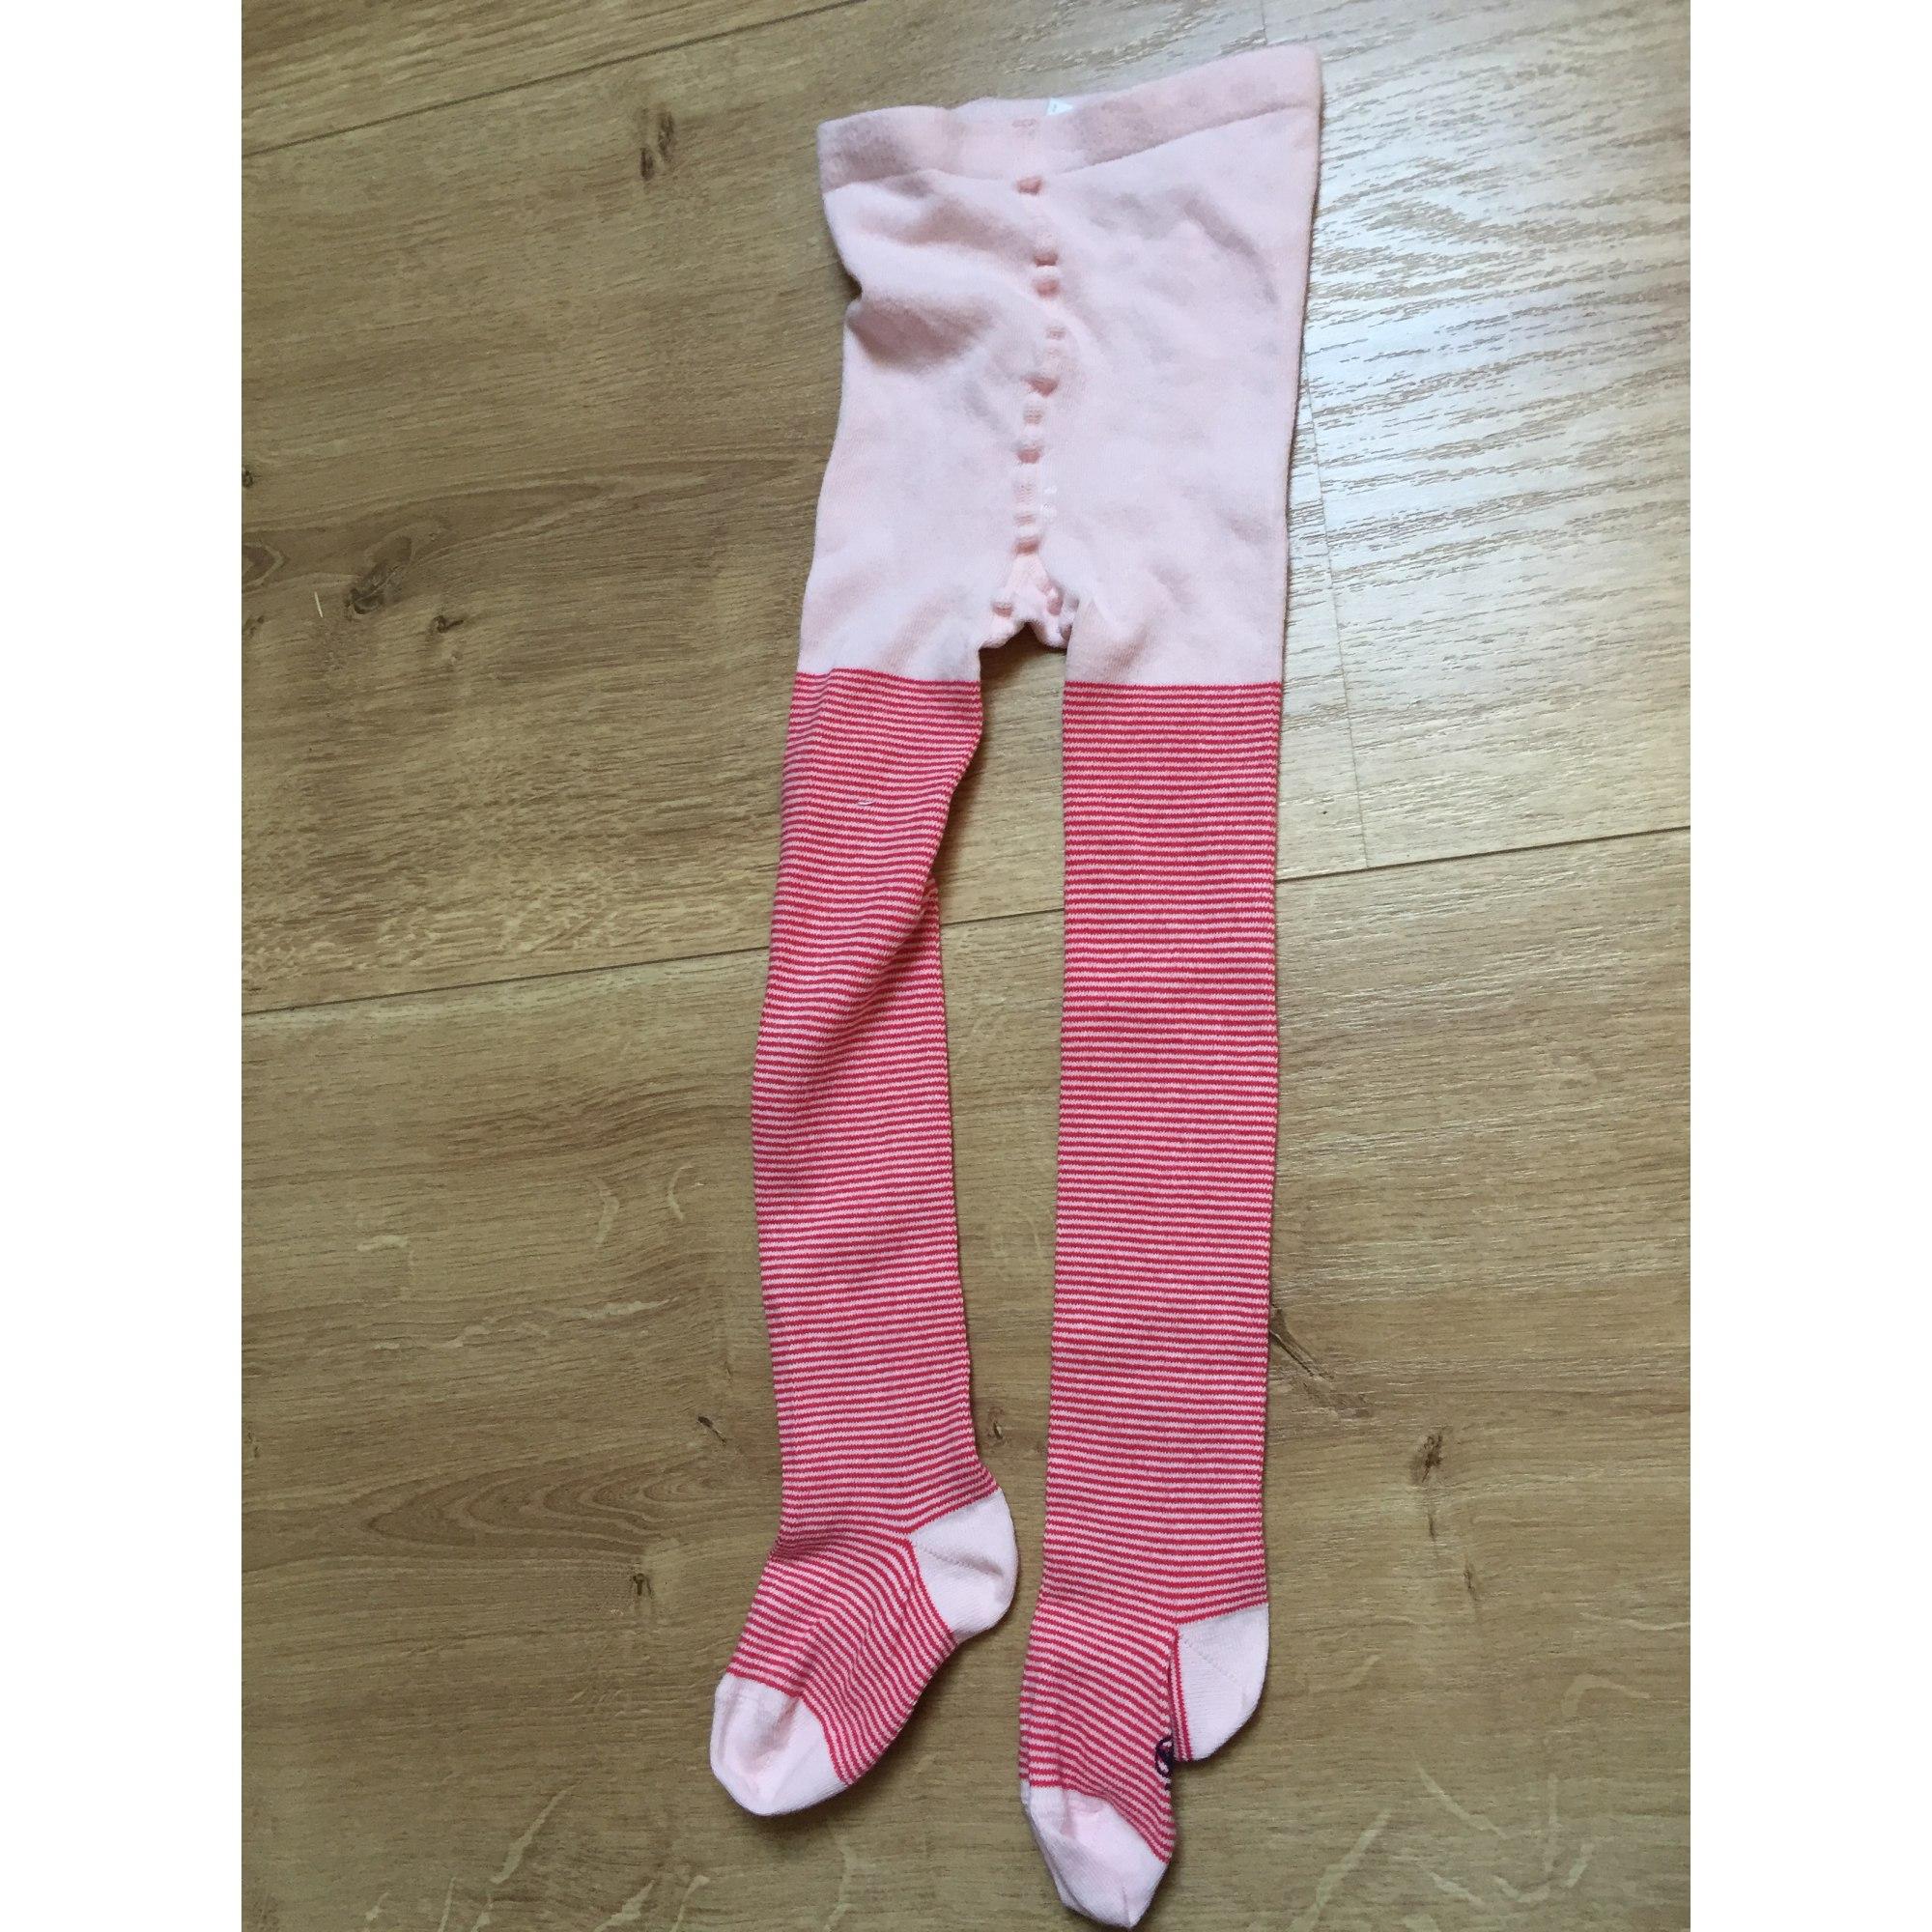 Tights PETIT BATEAU Pink, fuchsia, light pink